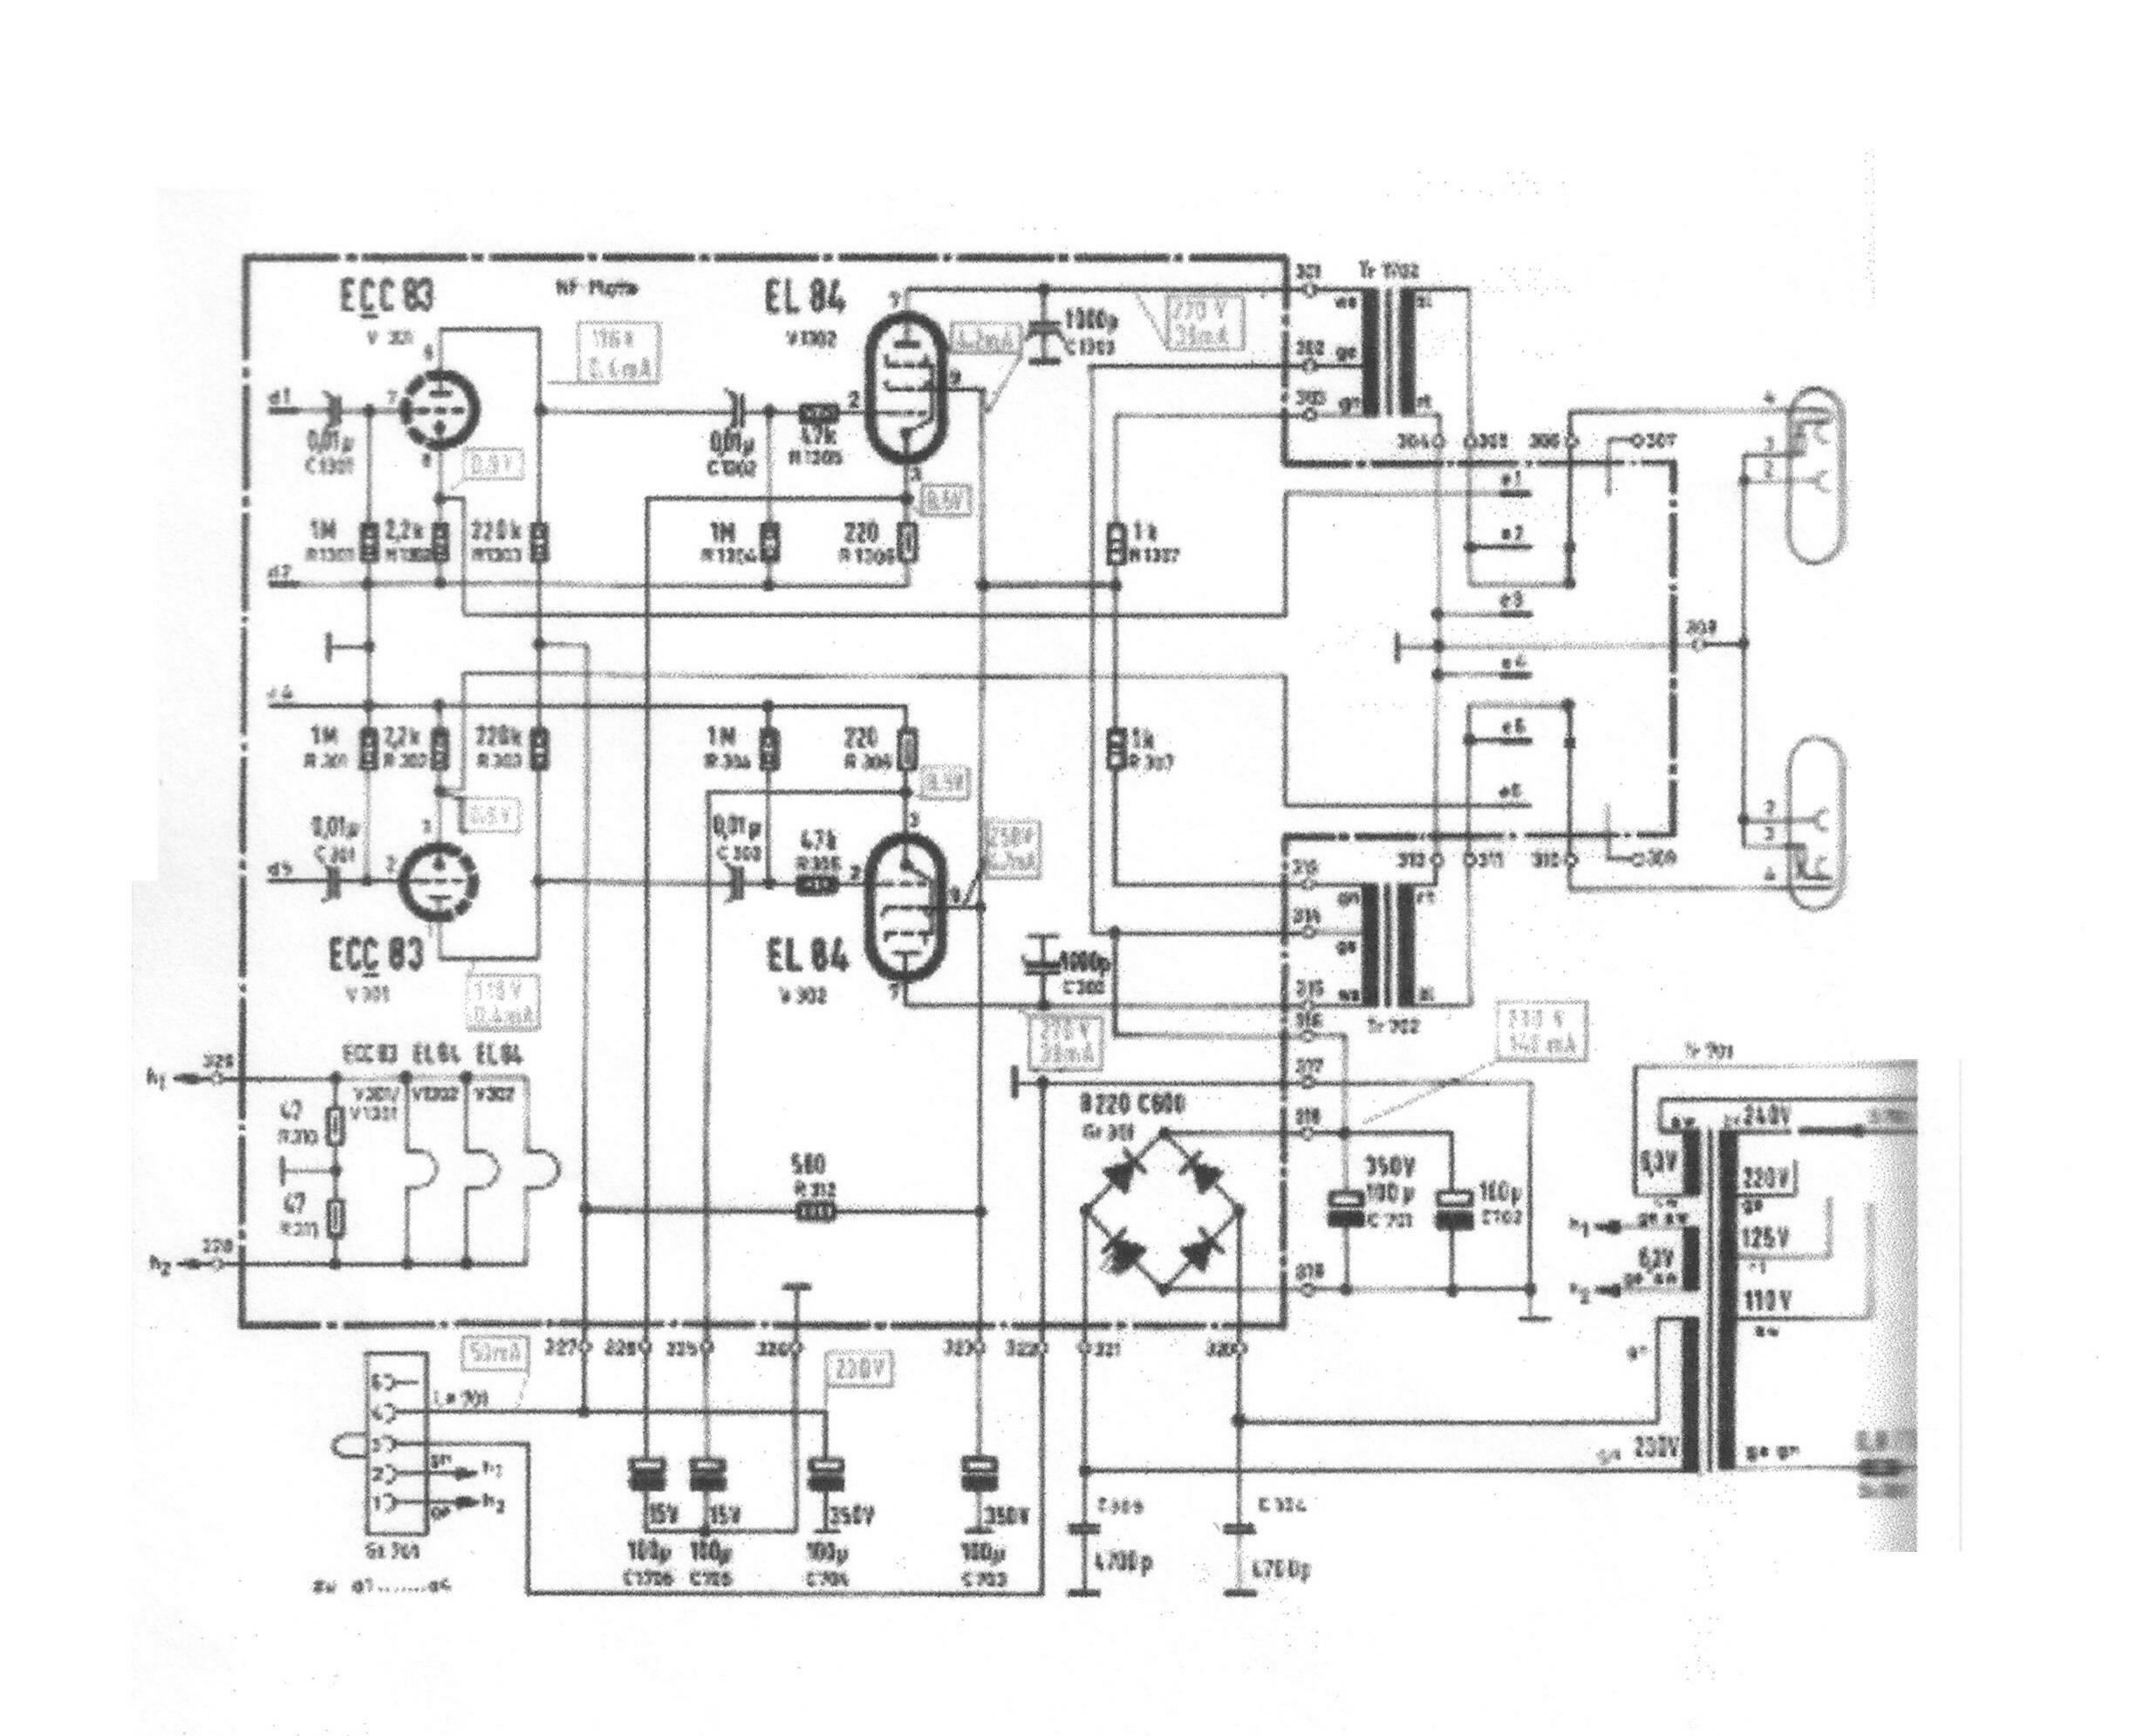 11 Amp Schematic Http Homeproviewcom Ecl82amplifierschematichtm Tube Classicsde Tc Germantubehifi Poweramps Telefunken202500 2500schematic